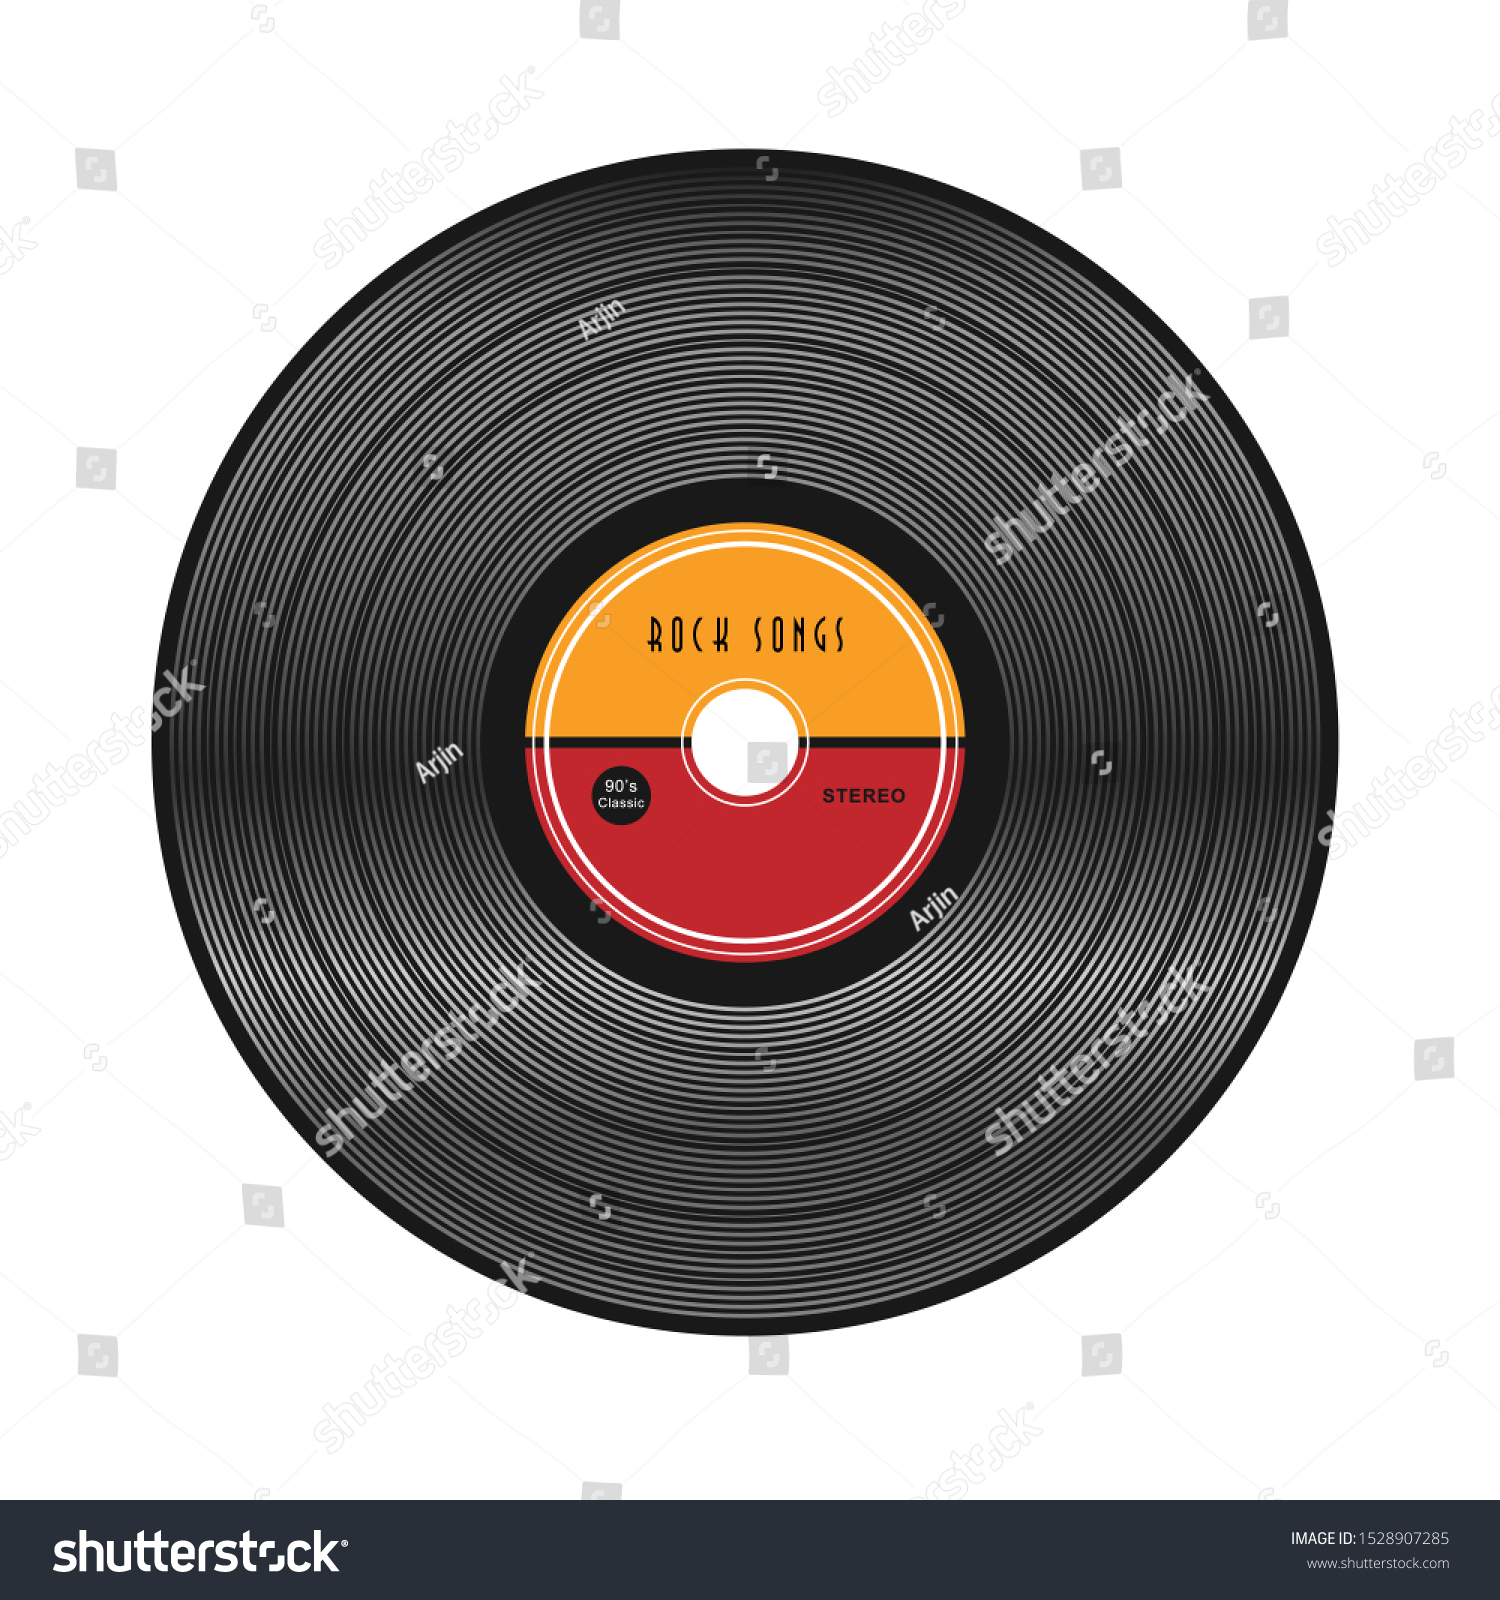 vinyl music record vintage gramophone disc stock vector royalty free 1528907285 https www shutterstock com image vector vinyl music record vintage gramophone disc 1528907285